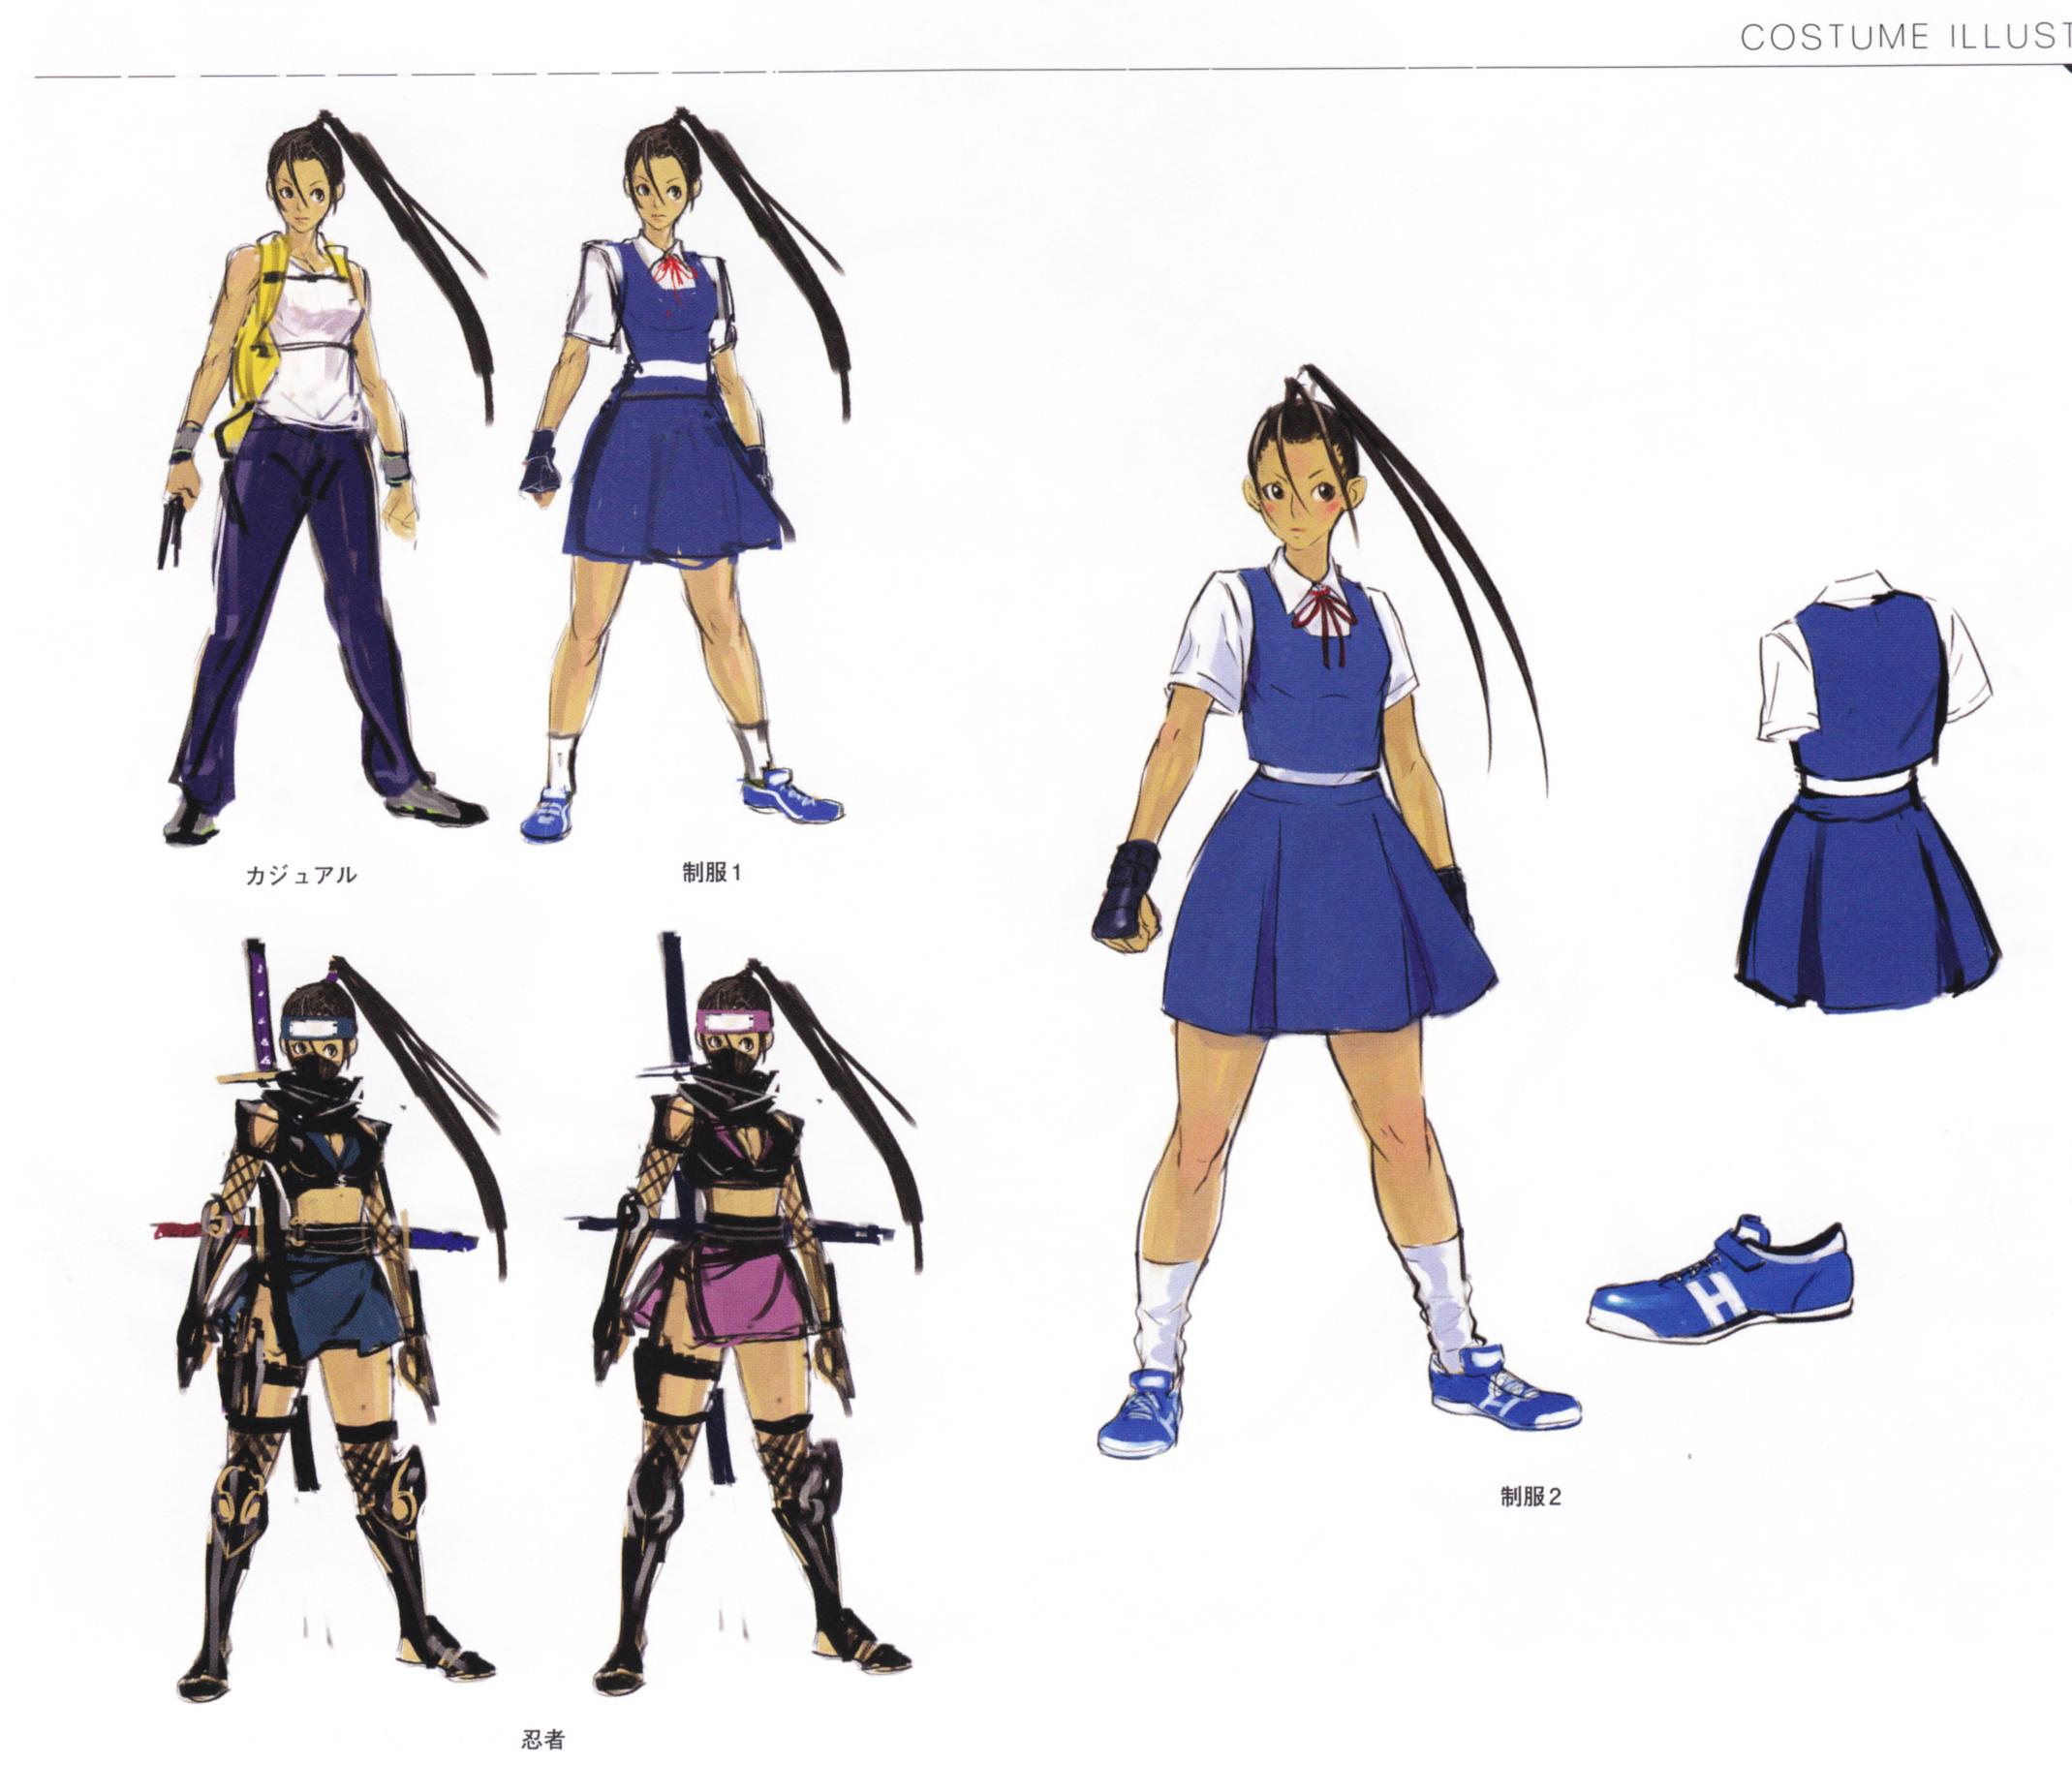 image ibuki alternate costumes concept art from super street